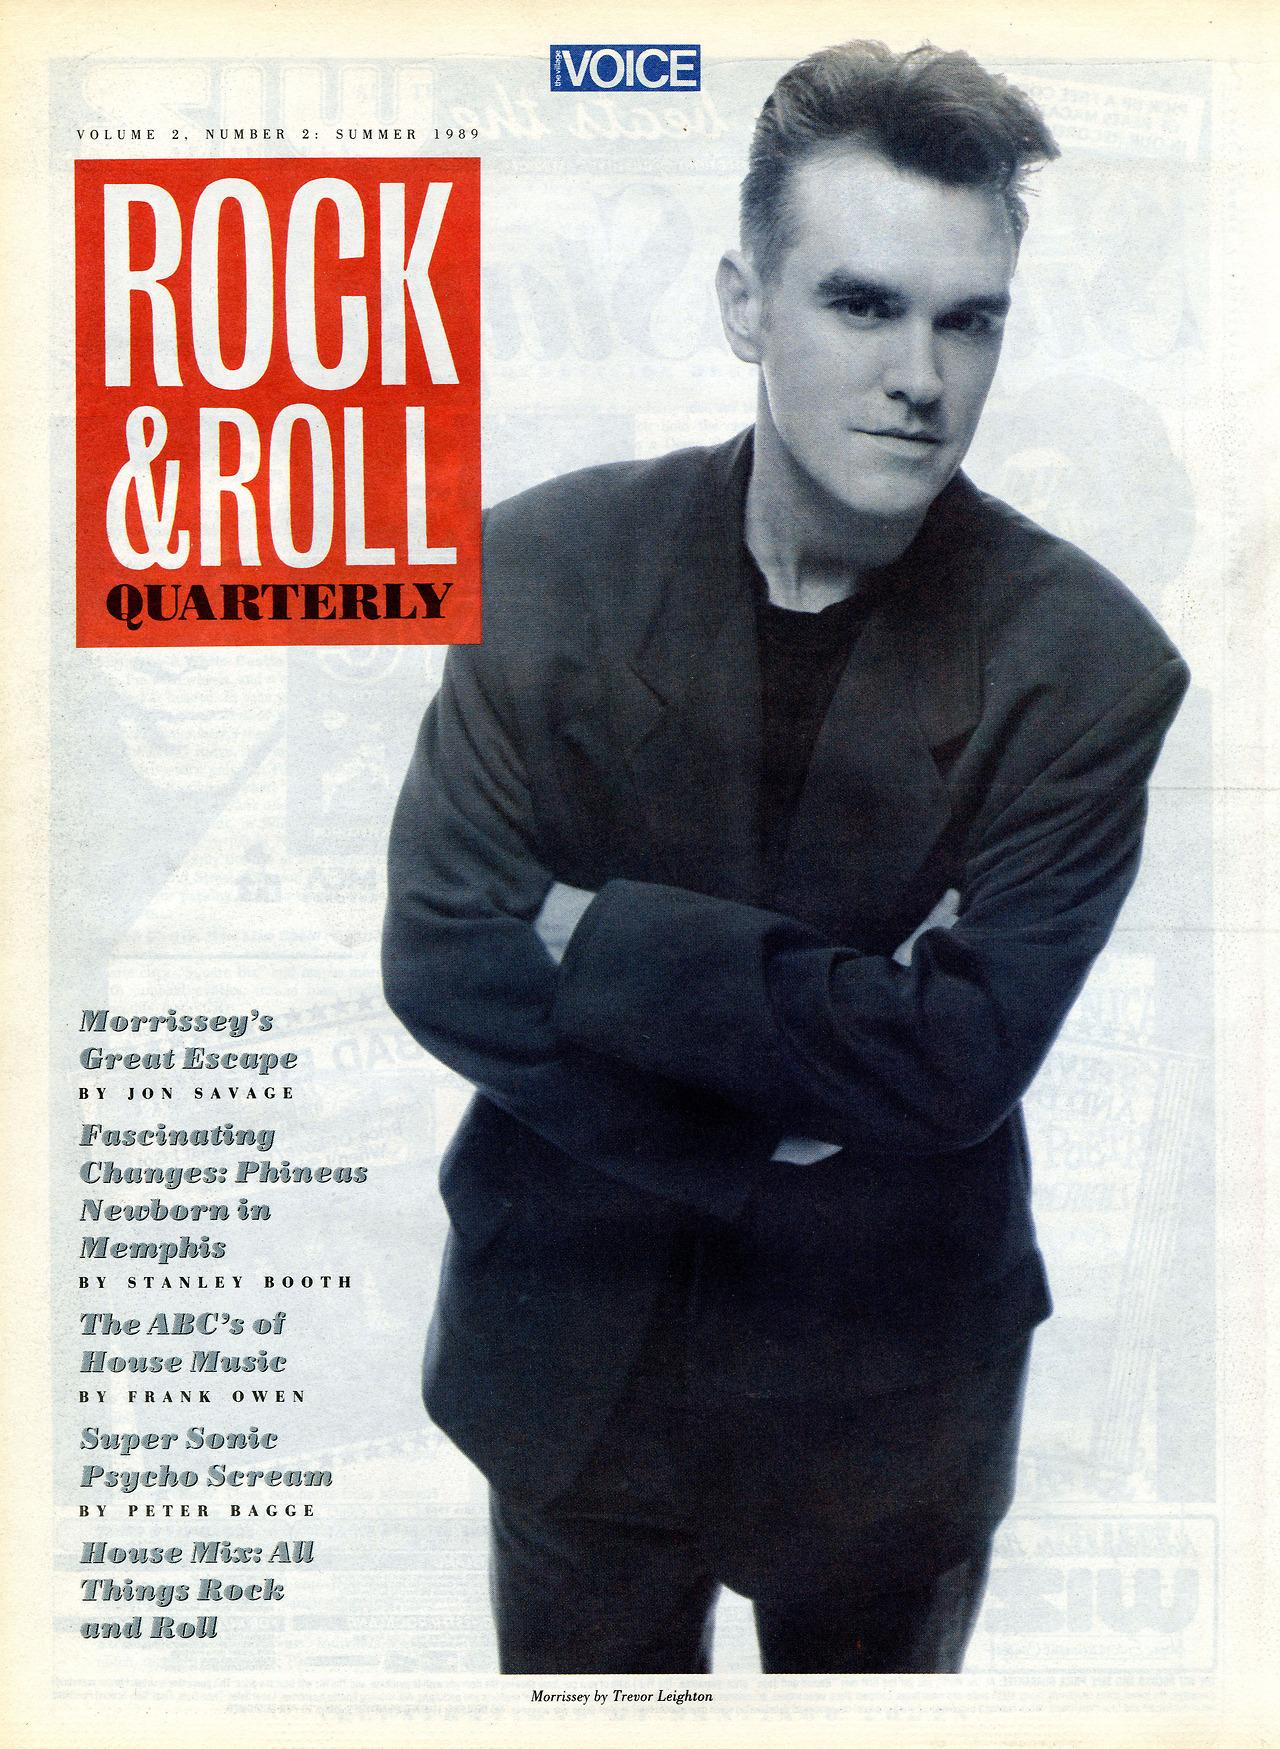 Morrissey Village Voice Jon Savage 1989.jpg